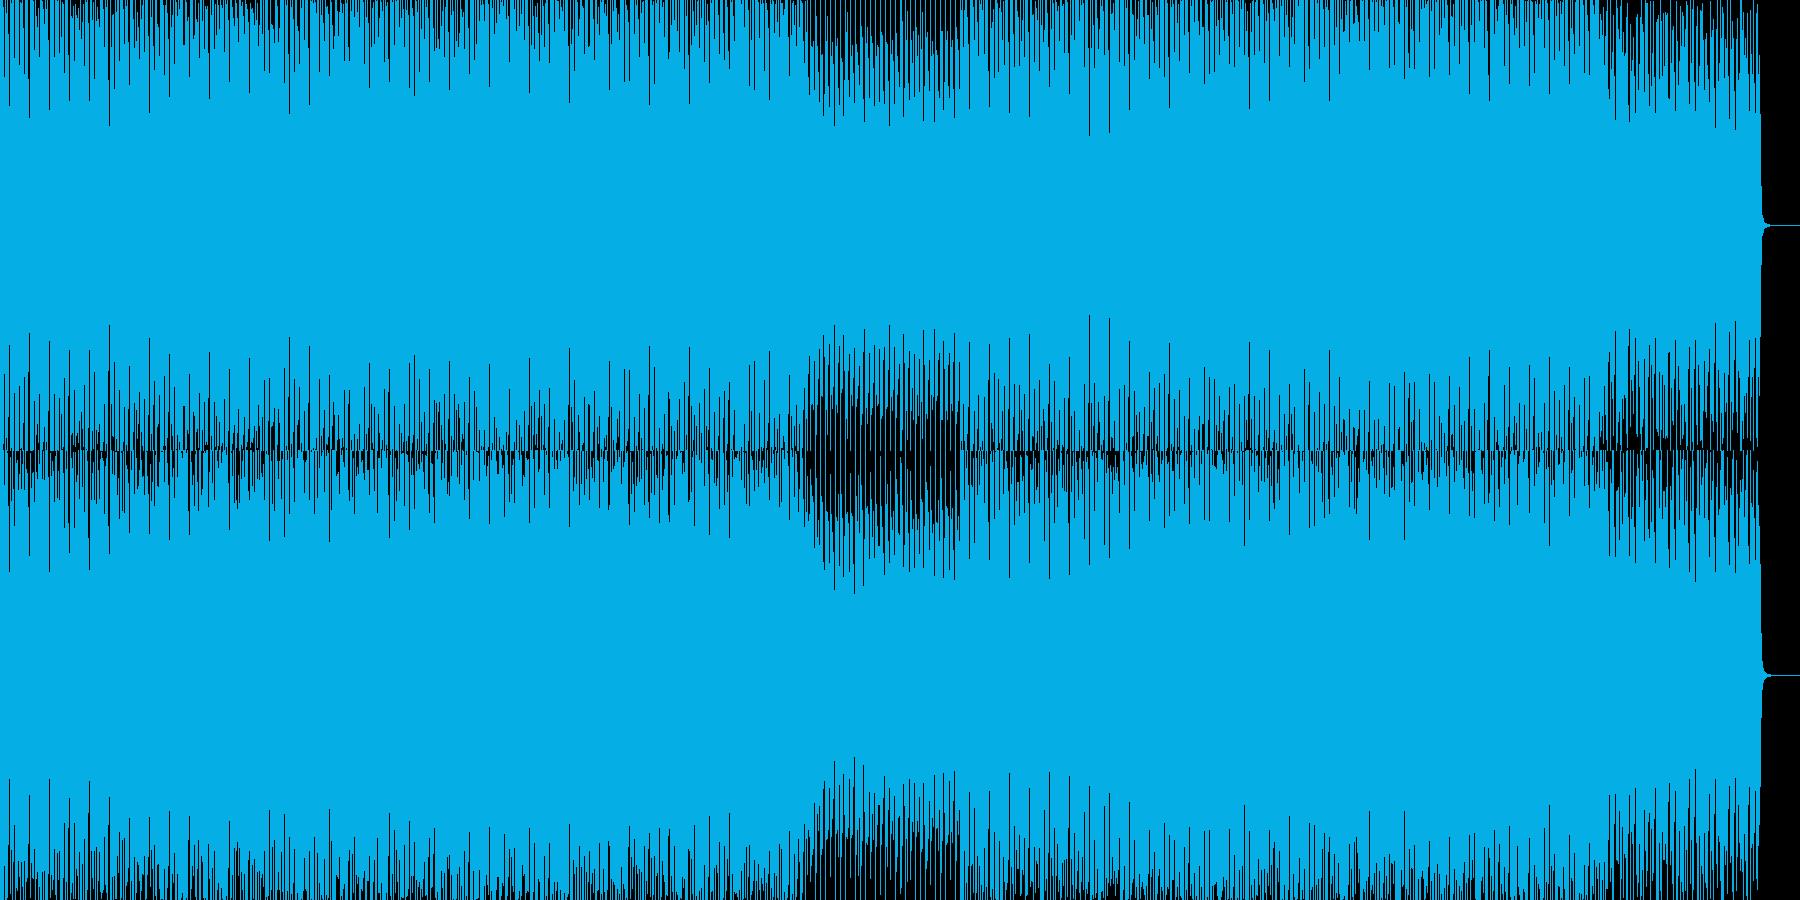 EDMクラブ系ダンスミュージック-56の再生済みの波形